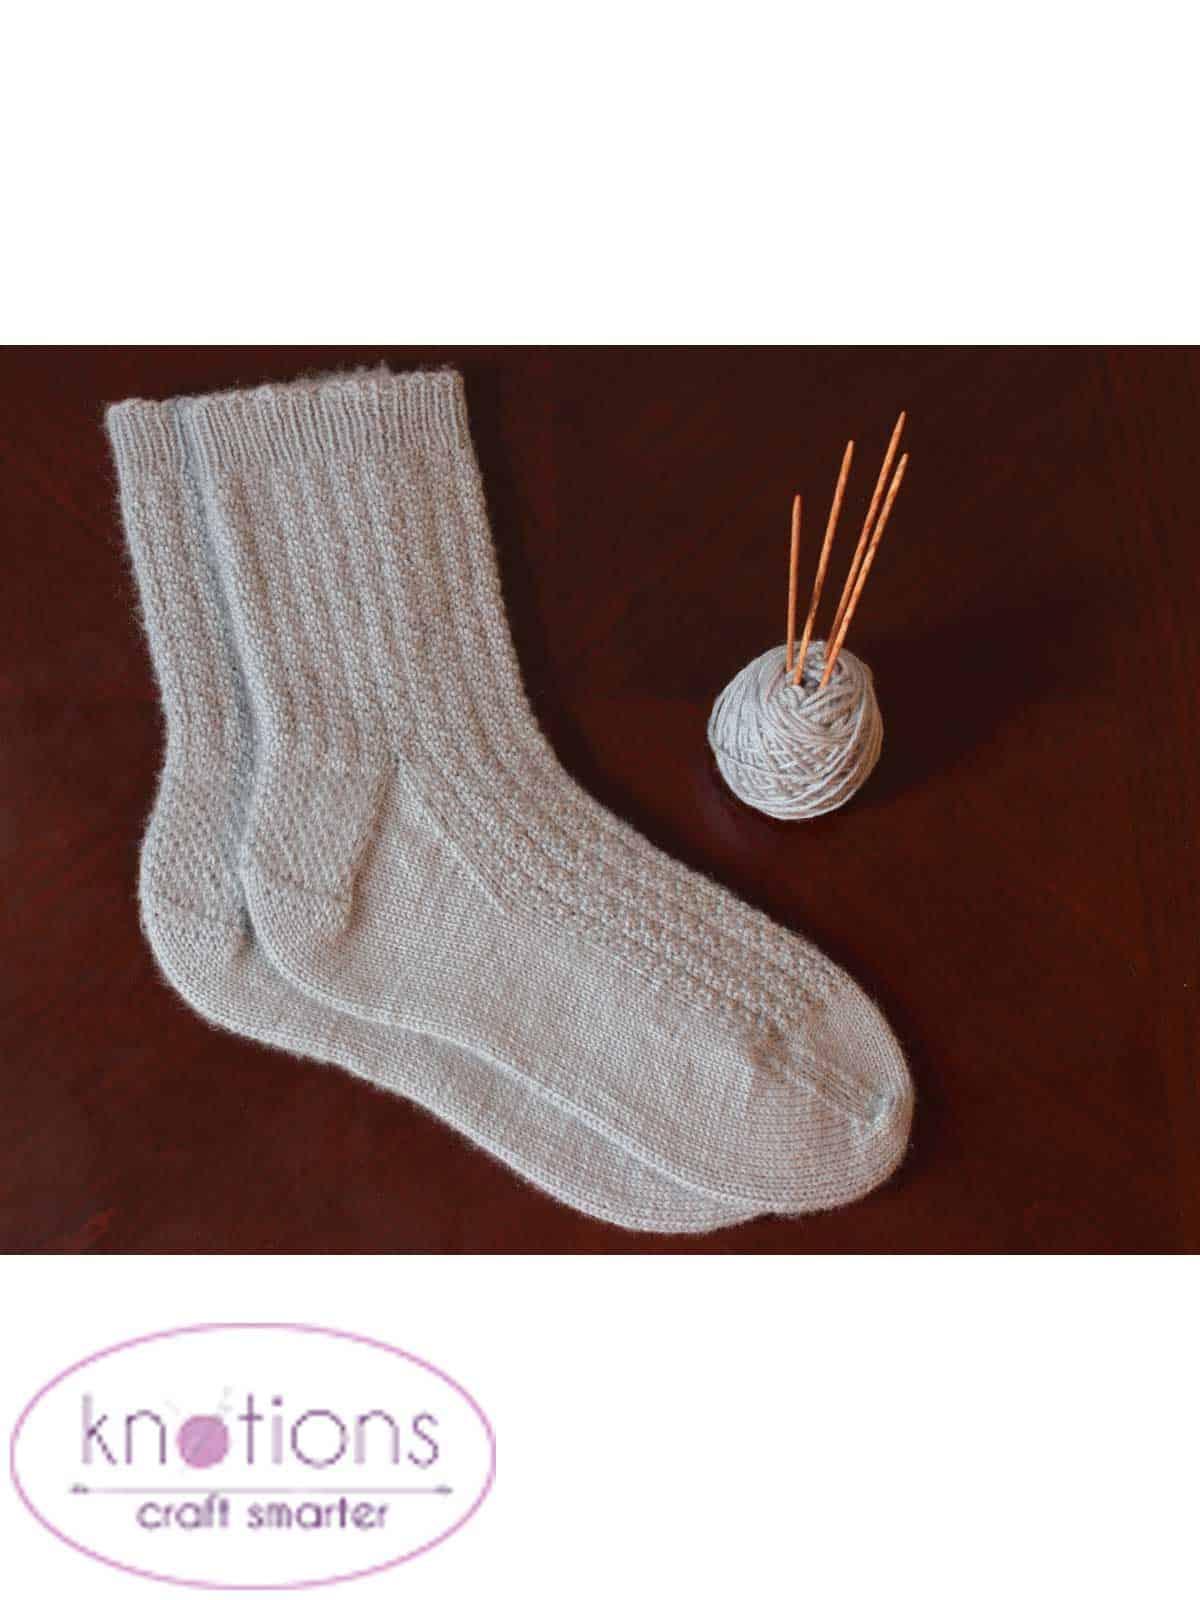 unassuming-socks-6